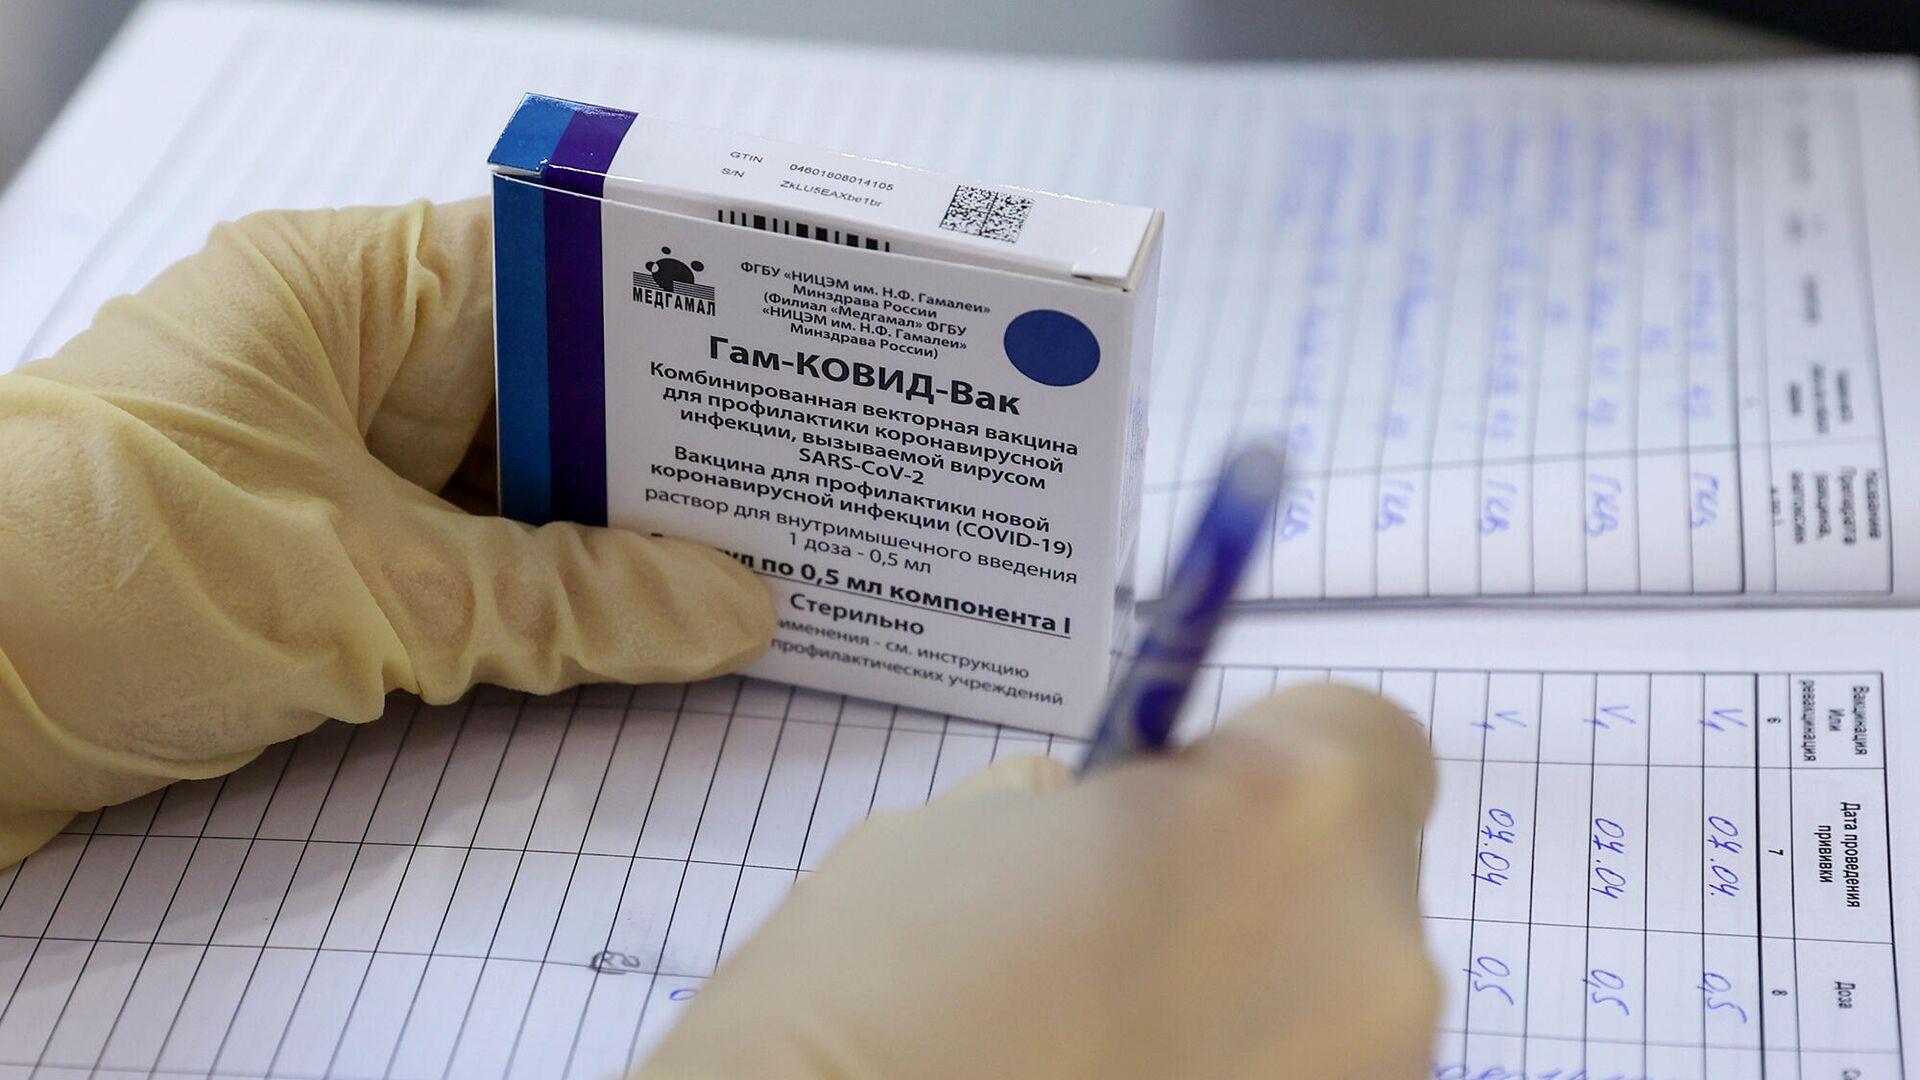 Медицинская сестра держит в руке упаковку с вакциной Гам-КОВИД-Вак (Спутник V) в пункте вакцинации от COVID-19 - РИА Новости, 1920, 02.05.2021